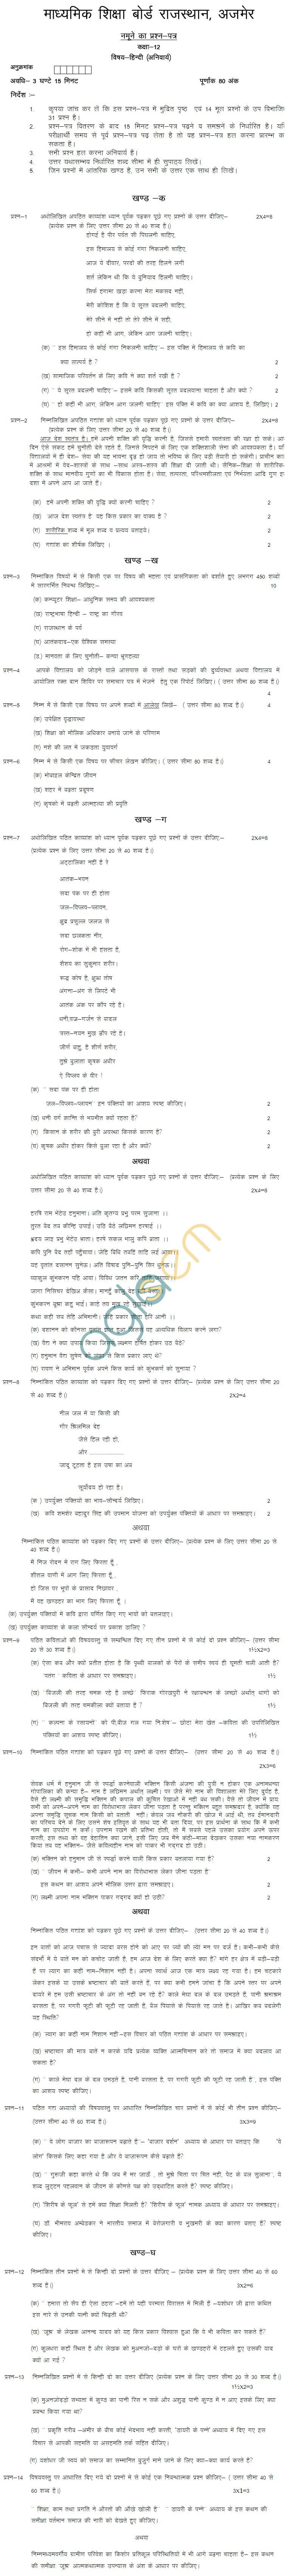 Rajasthan Board Class 12 Hindi Com Model Question Paper